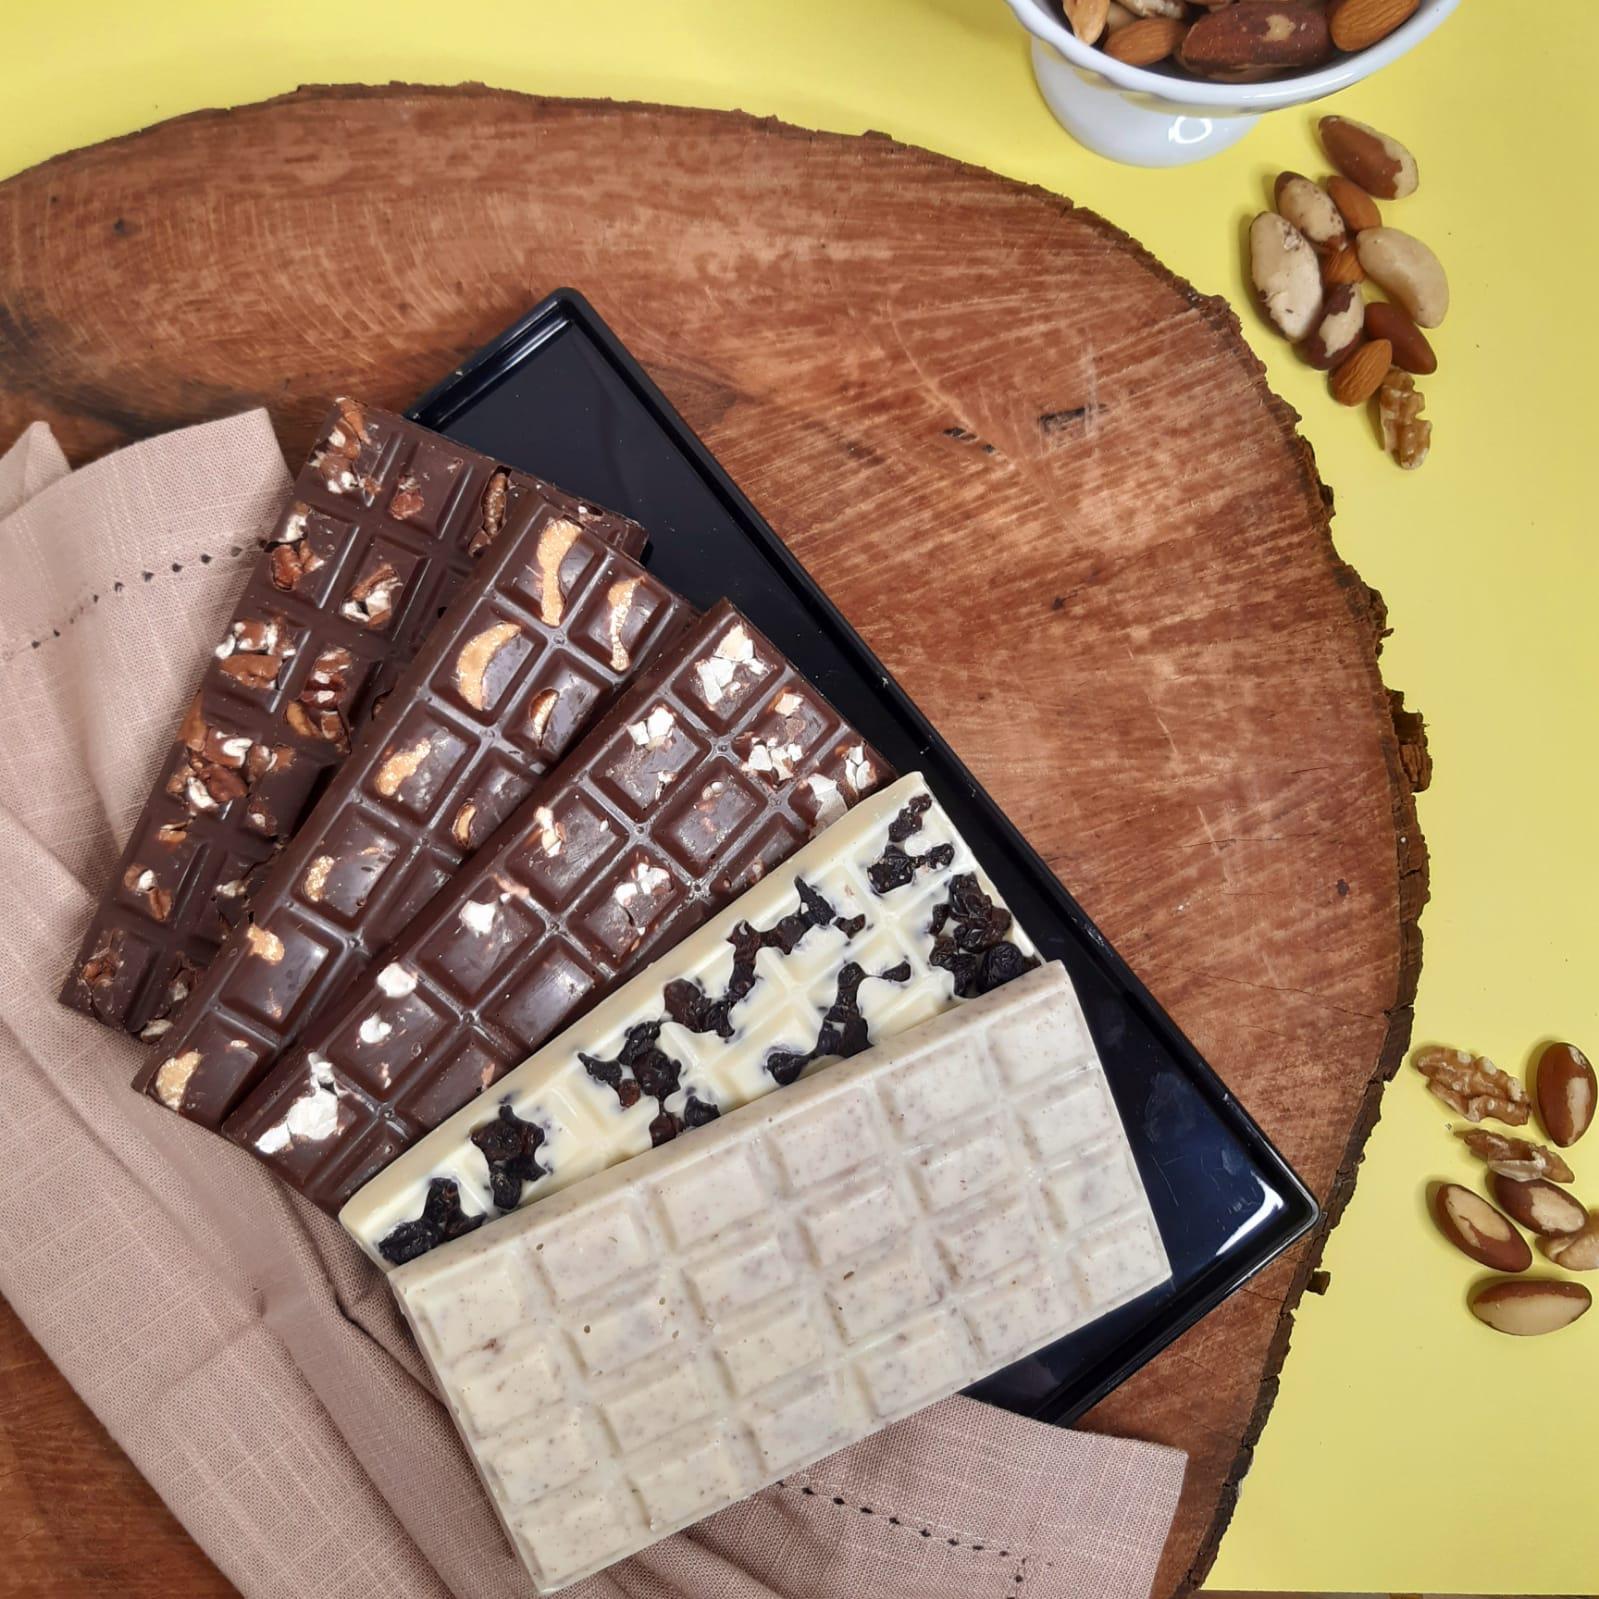 Kit - 3 Barras de Chocolate ao Leite Belga com Nuts + 2 Barras de Chocolate Branco exclusivas